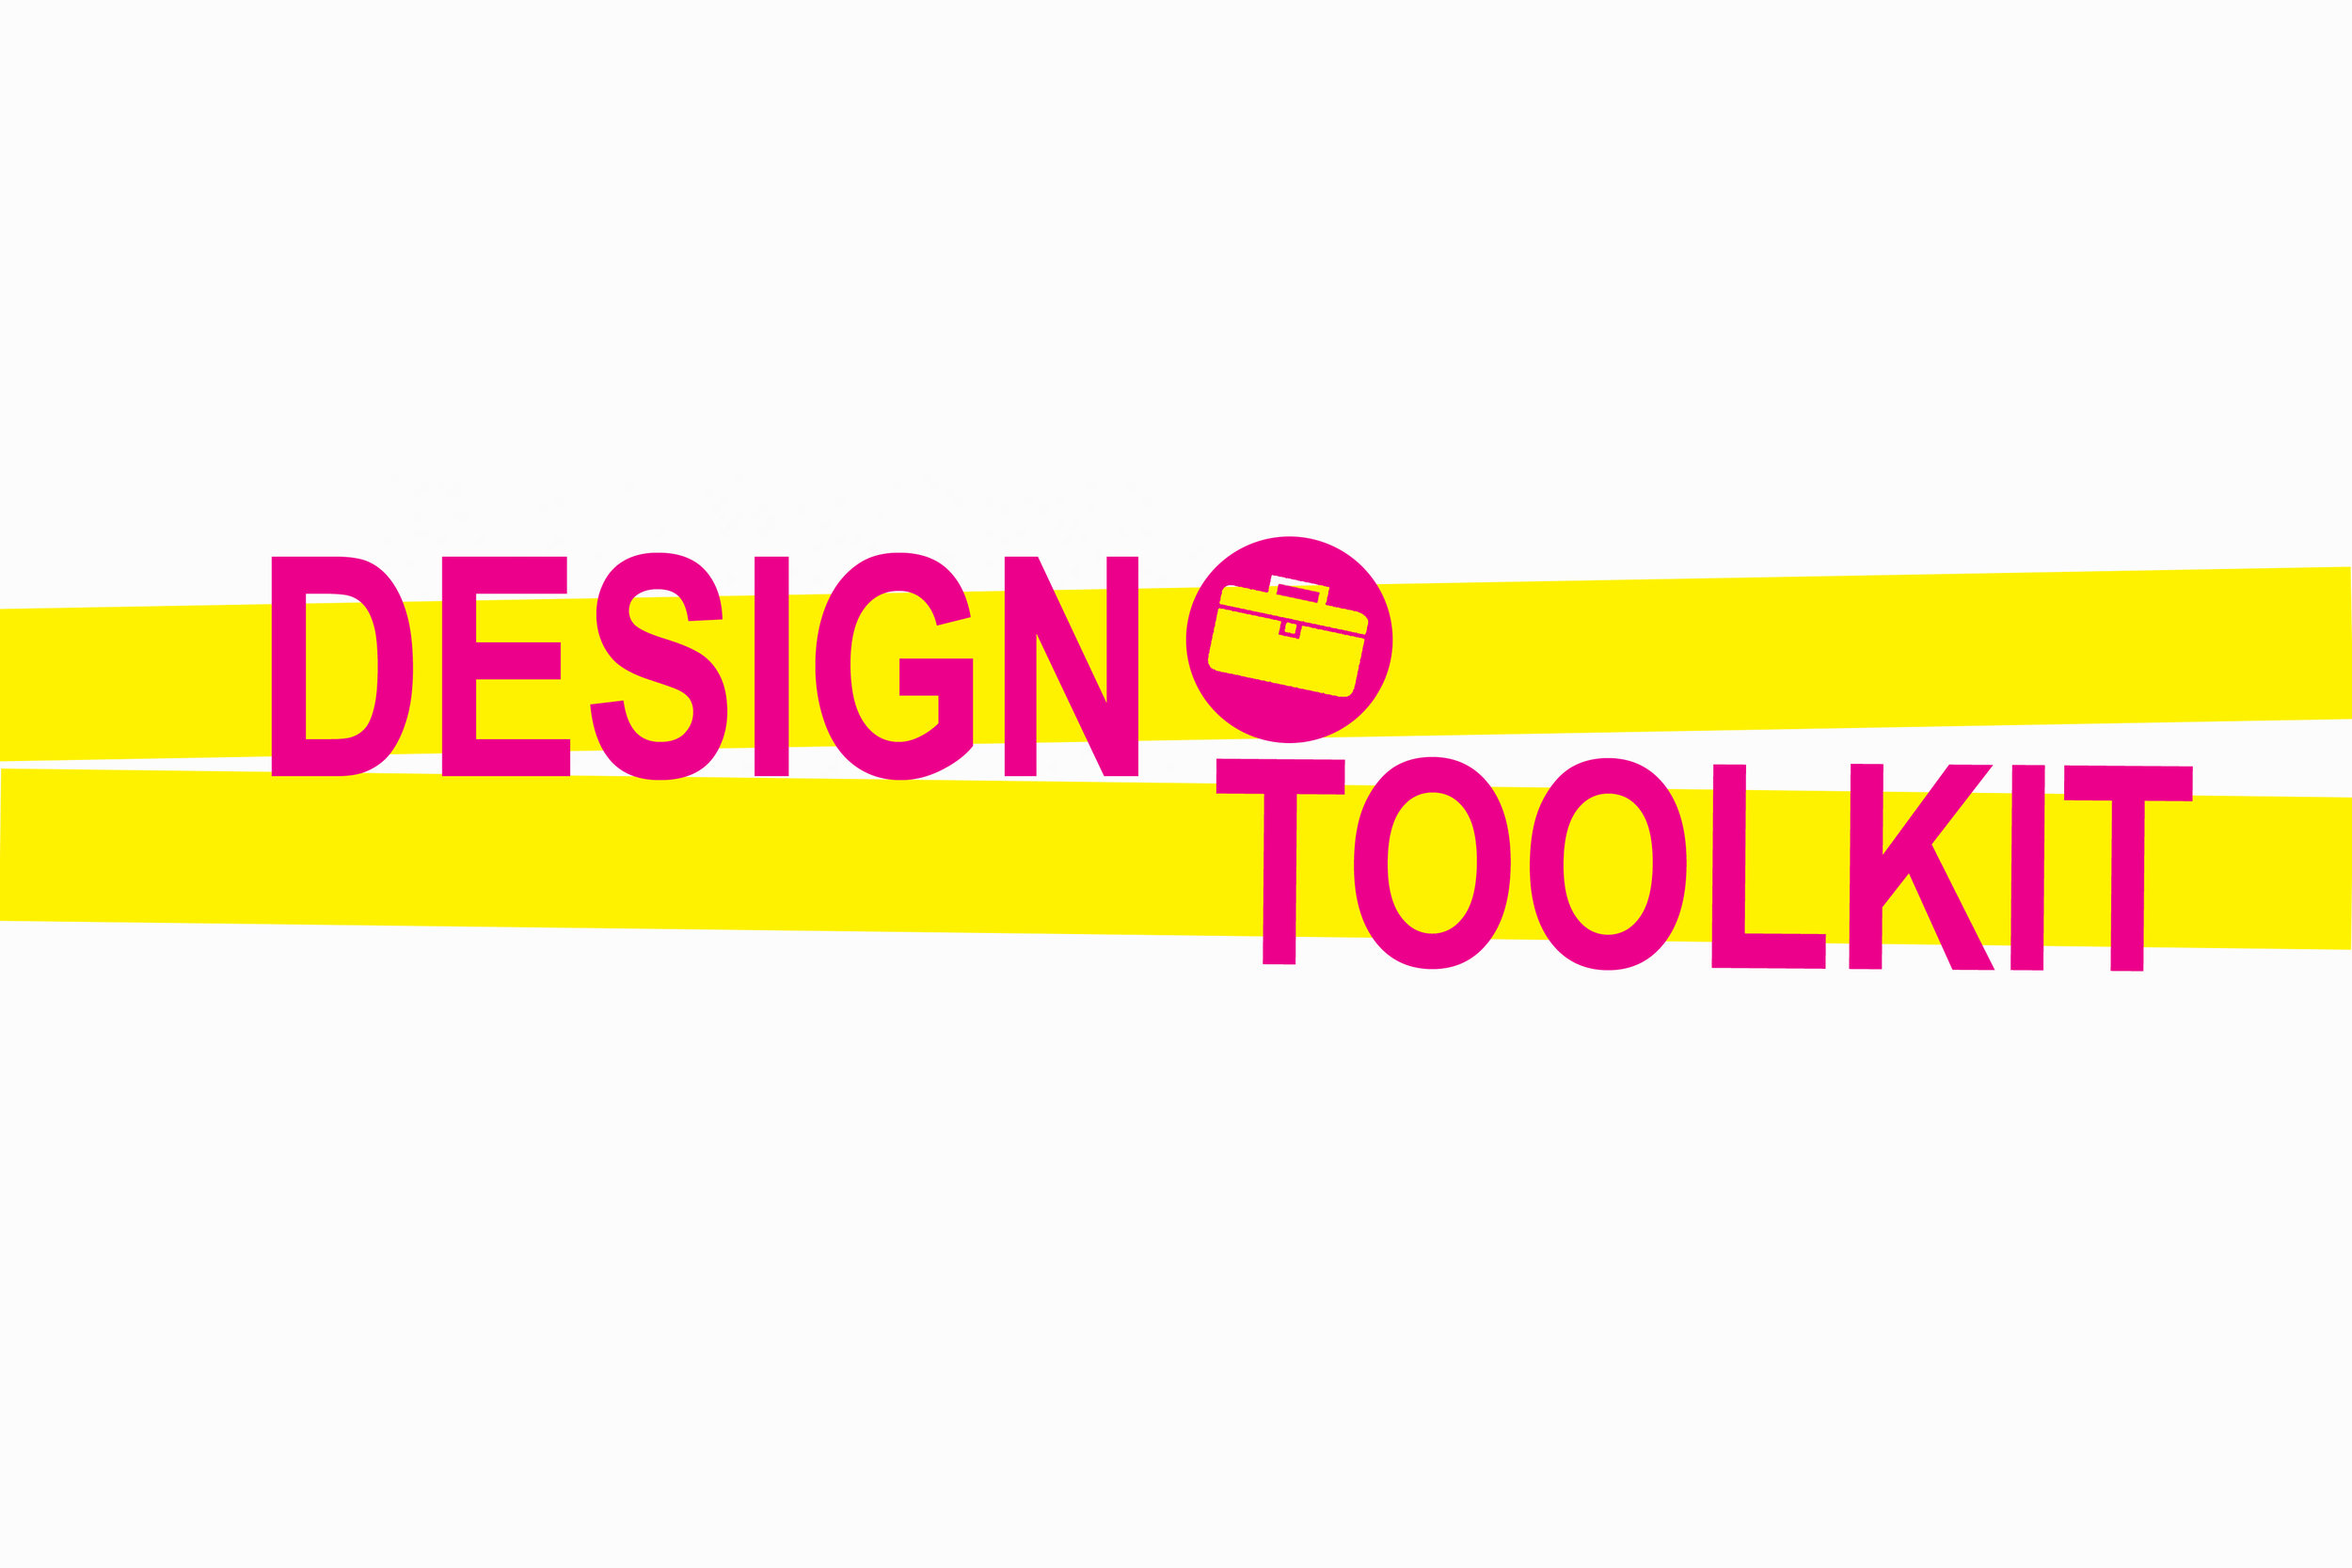 design toolkit title for website.jpg